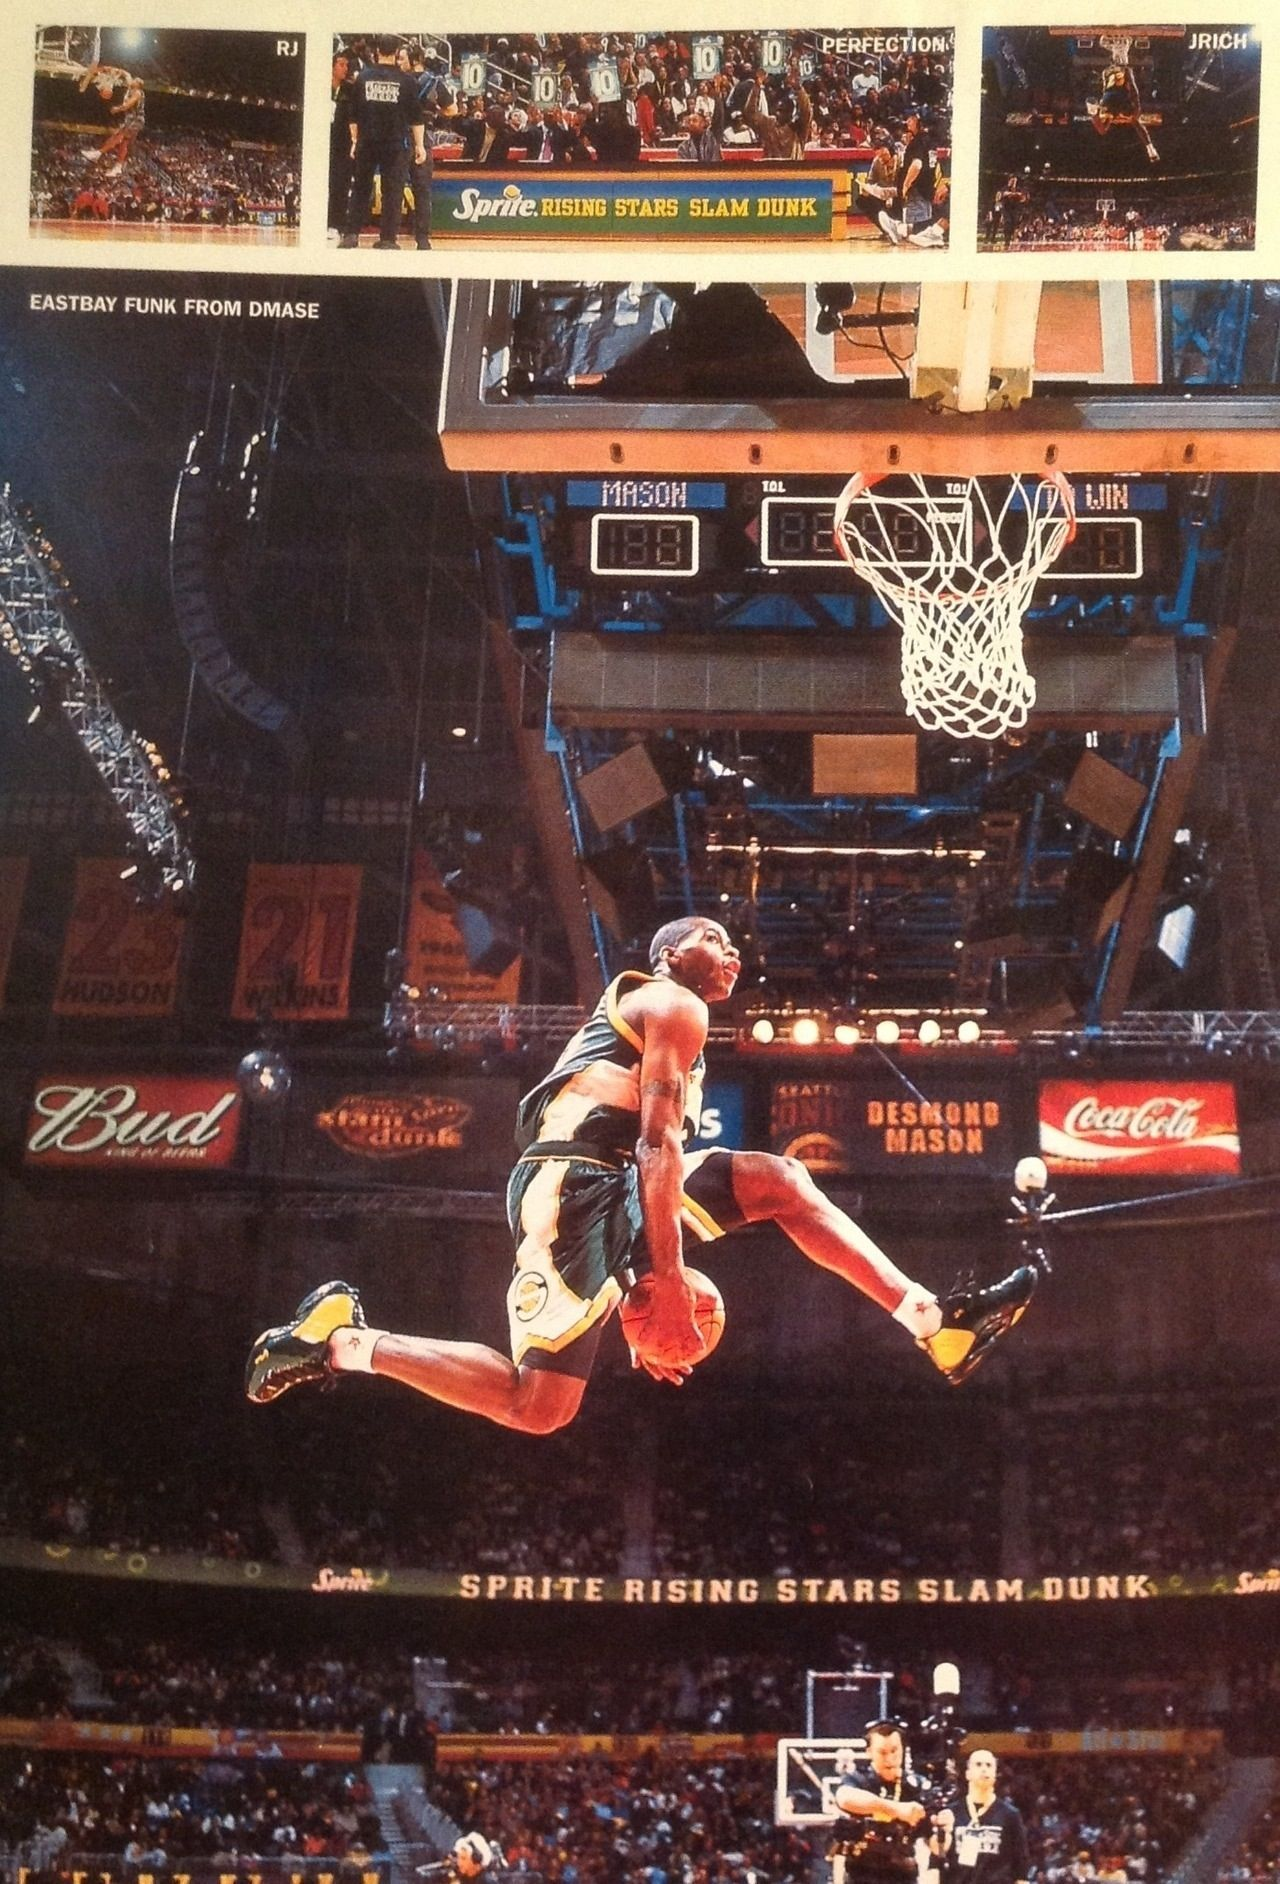 Desmond Mason Seattle Supersonics Slam Dunk Contest (With